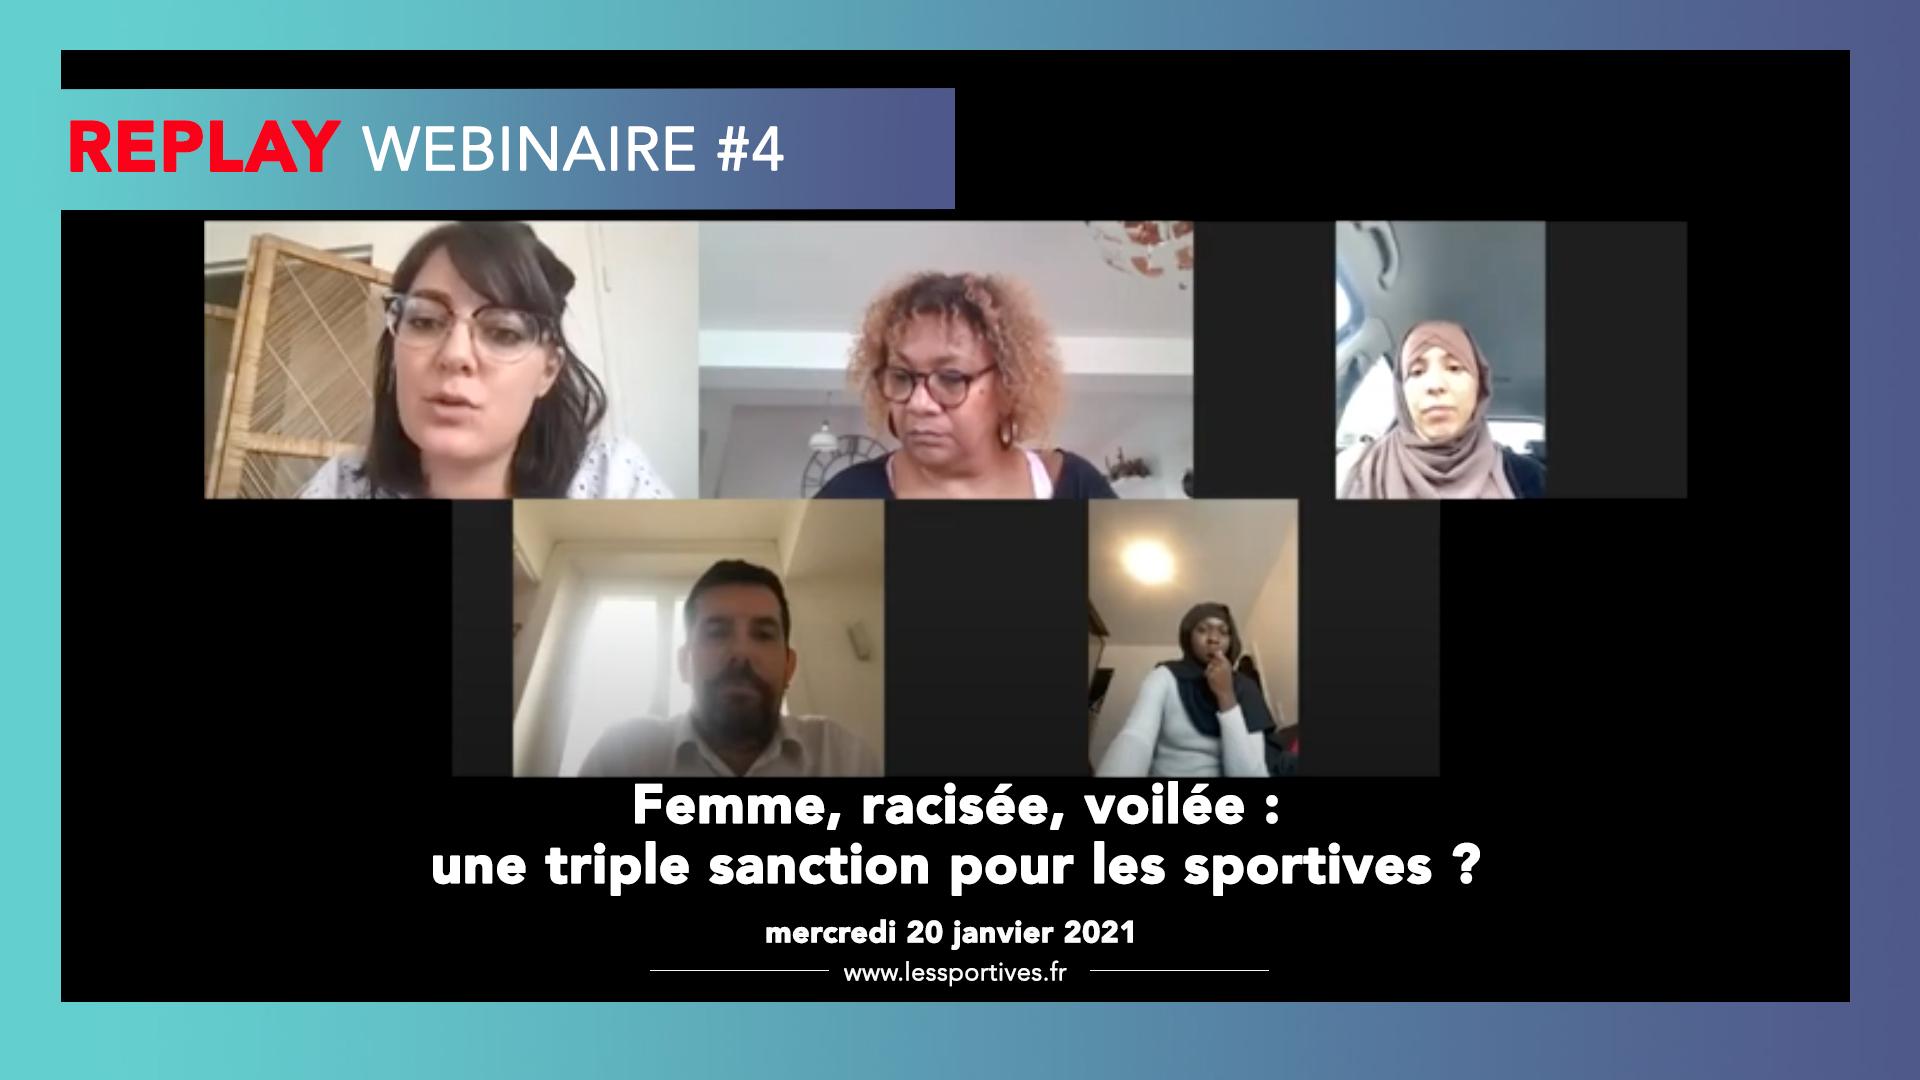 Bilan webinaire #4 Les Sportives